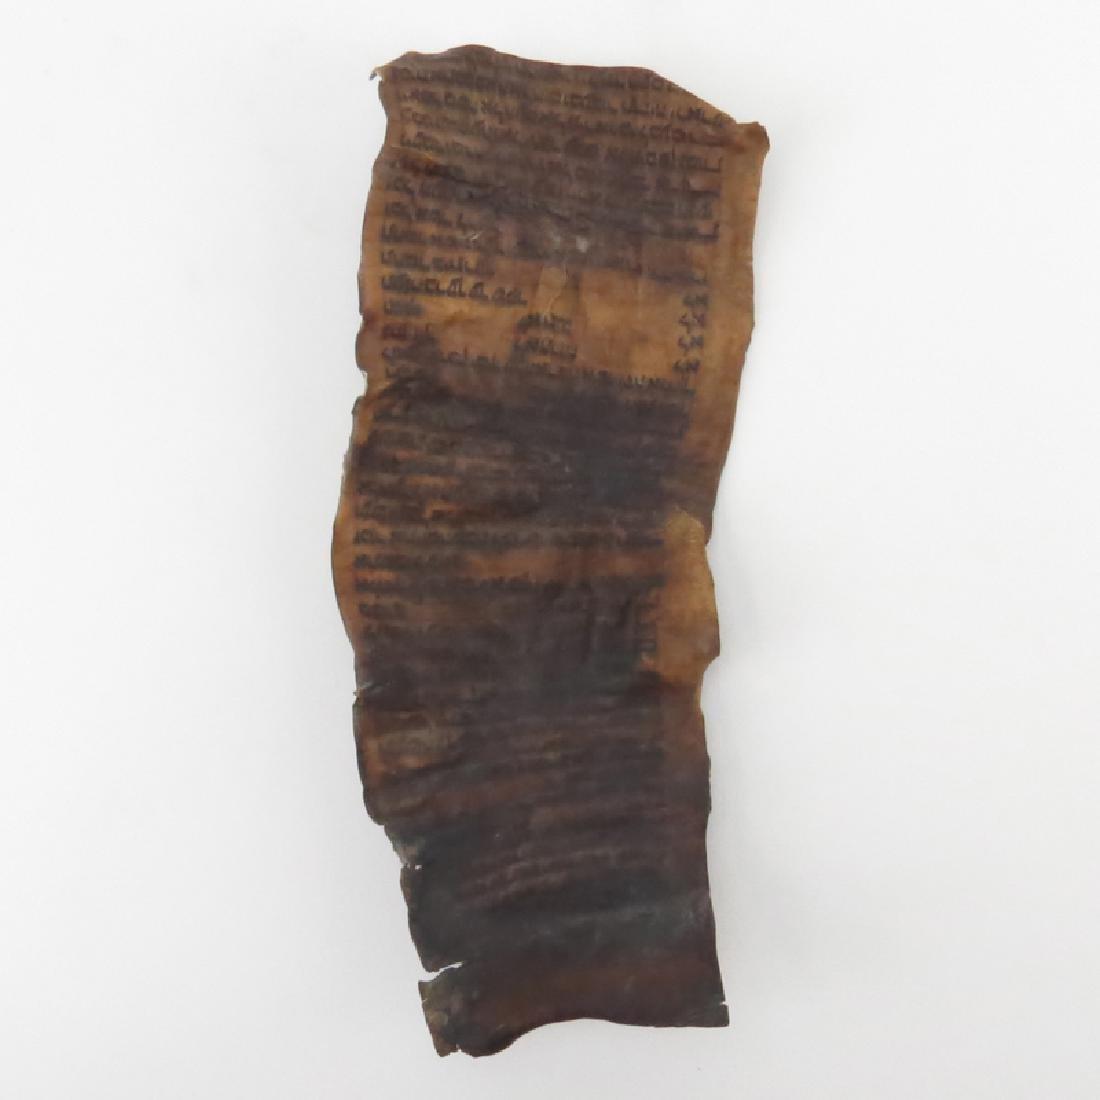 Ancient Judaica Hand Written Parchment Fragment.